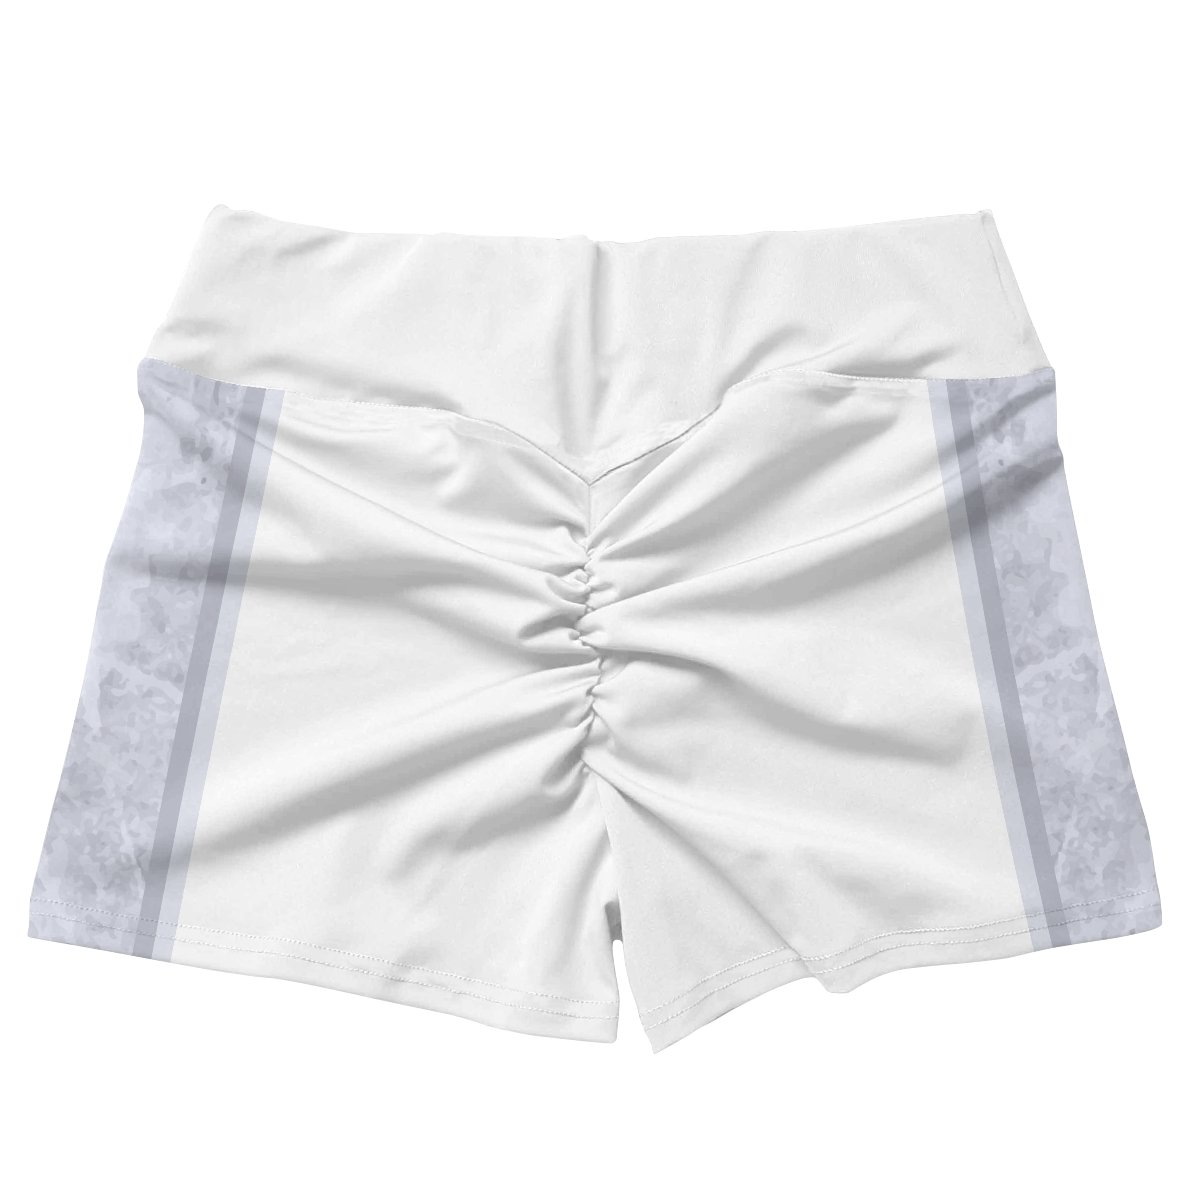 pokemon ice uniform active wear set 924100 - Anime Swimsuits